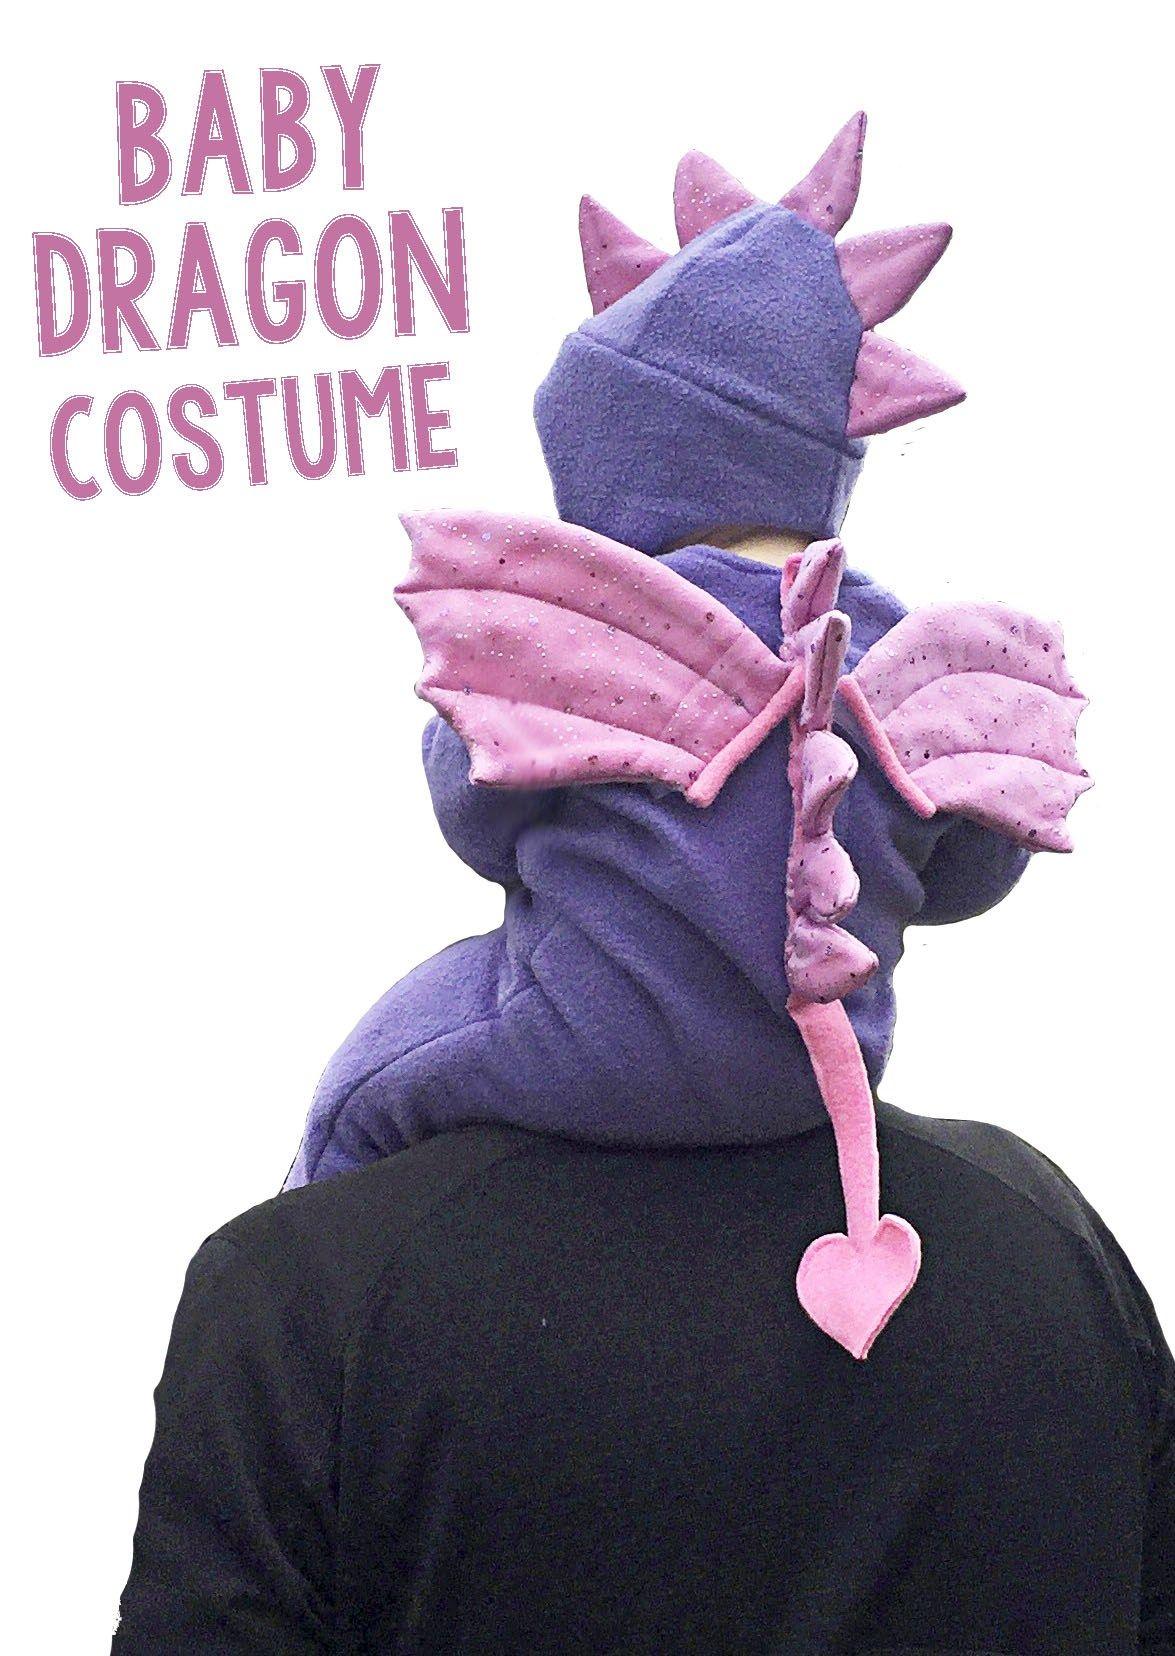 Baby Dragon Costume Baby Dragon Costume Dragon Costume